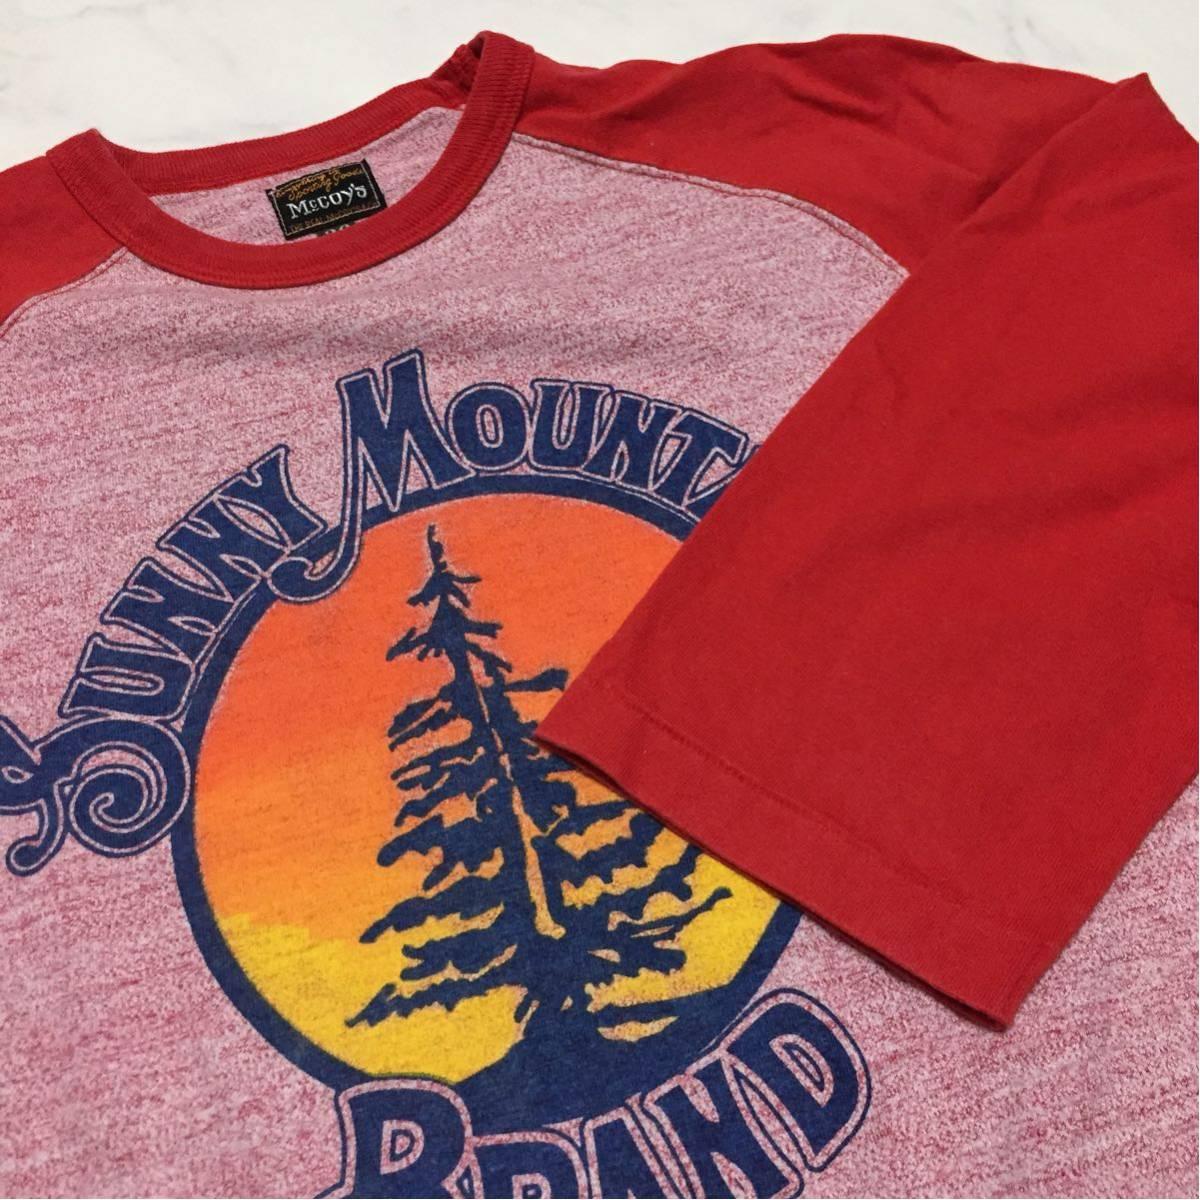 REAL McCOY'S リアルマッコイズ マッコイ ラグラン 7分丈Tシャツ 36 S_画像4